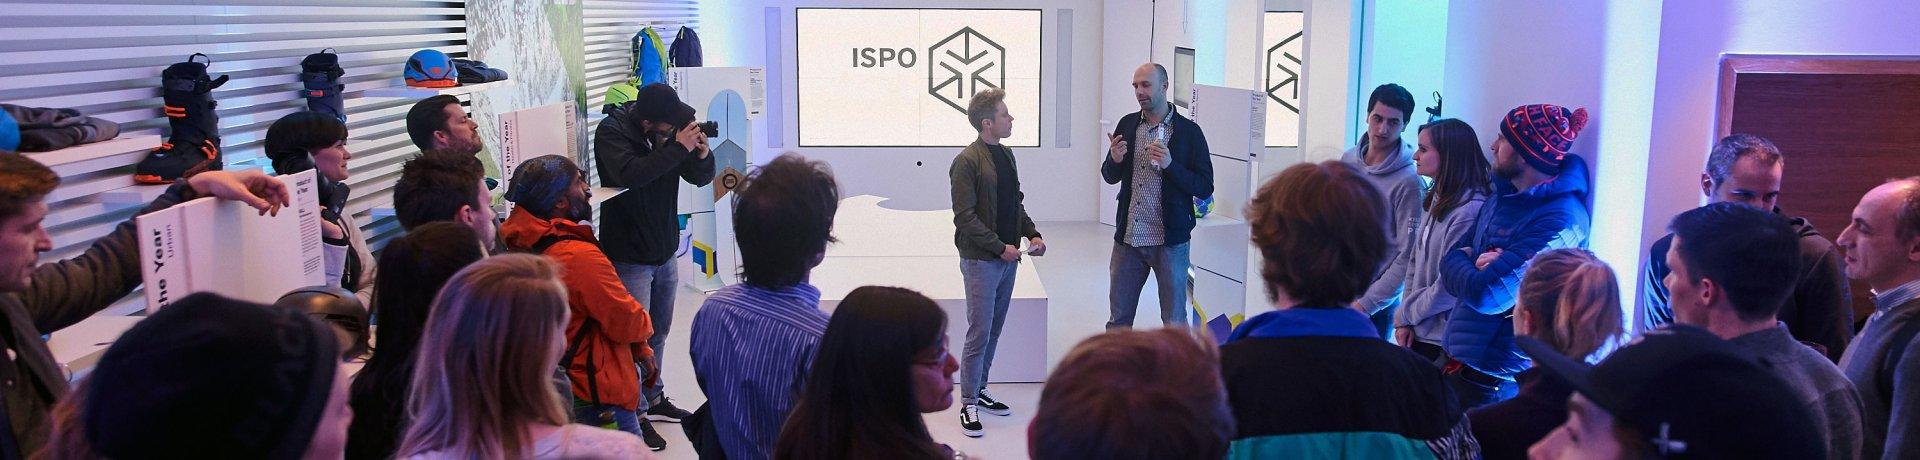 Events | Ispo com